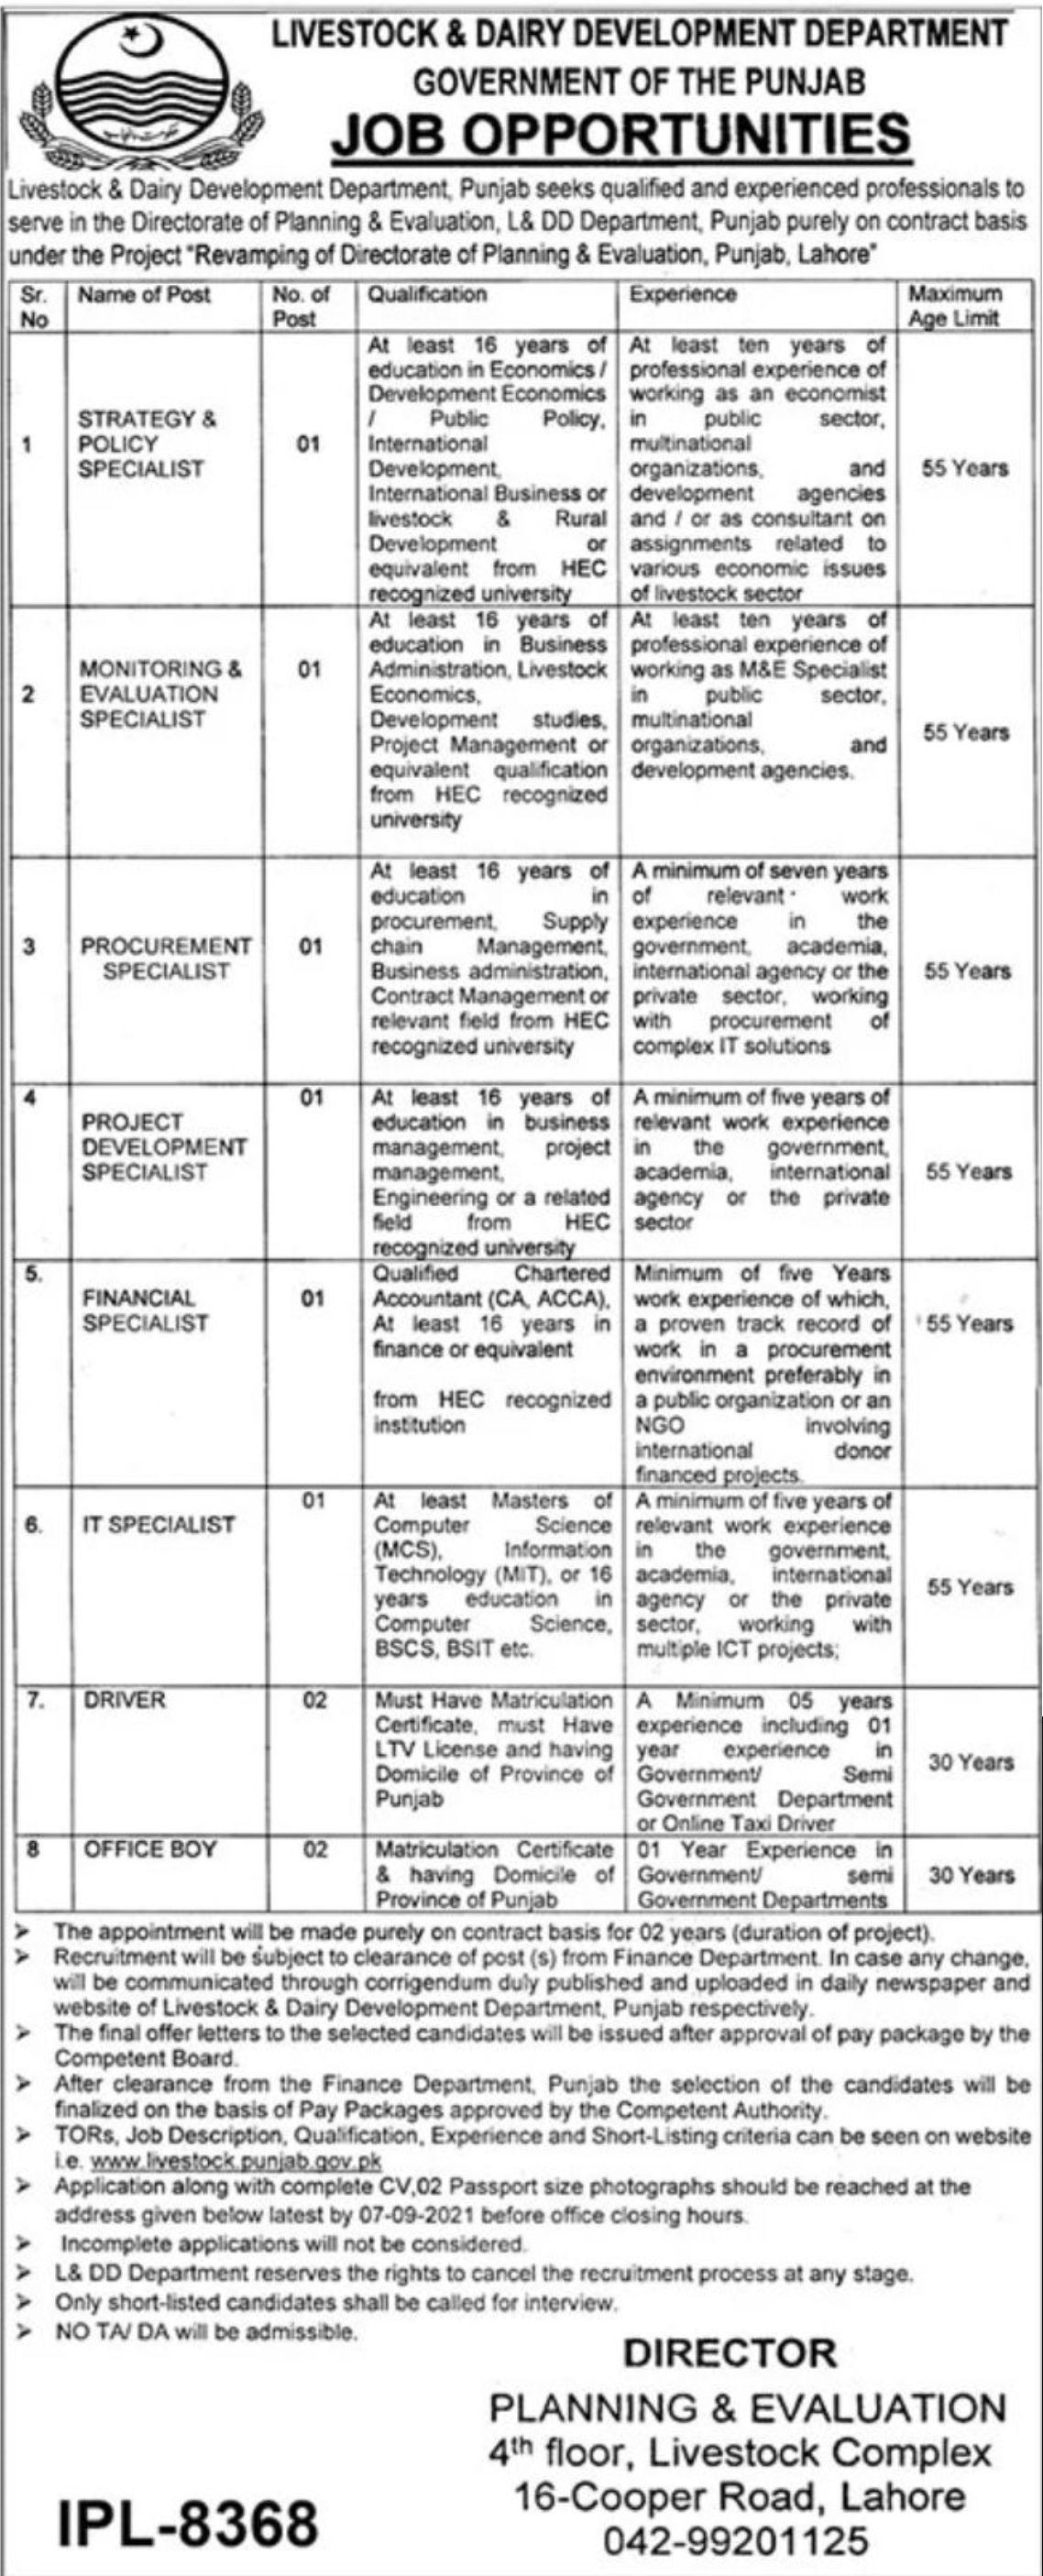 Livestock & Dairy Development Department Government of the Punjab Vacancies 2021 2